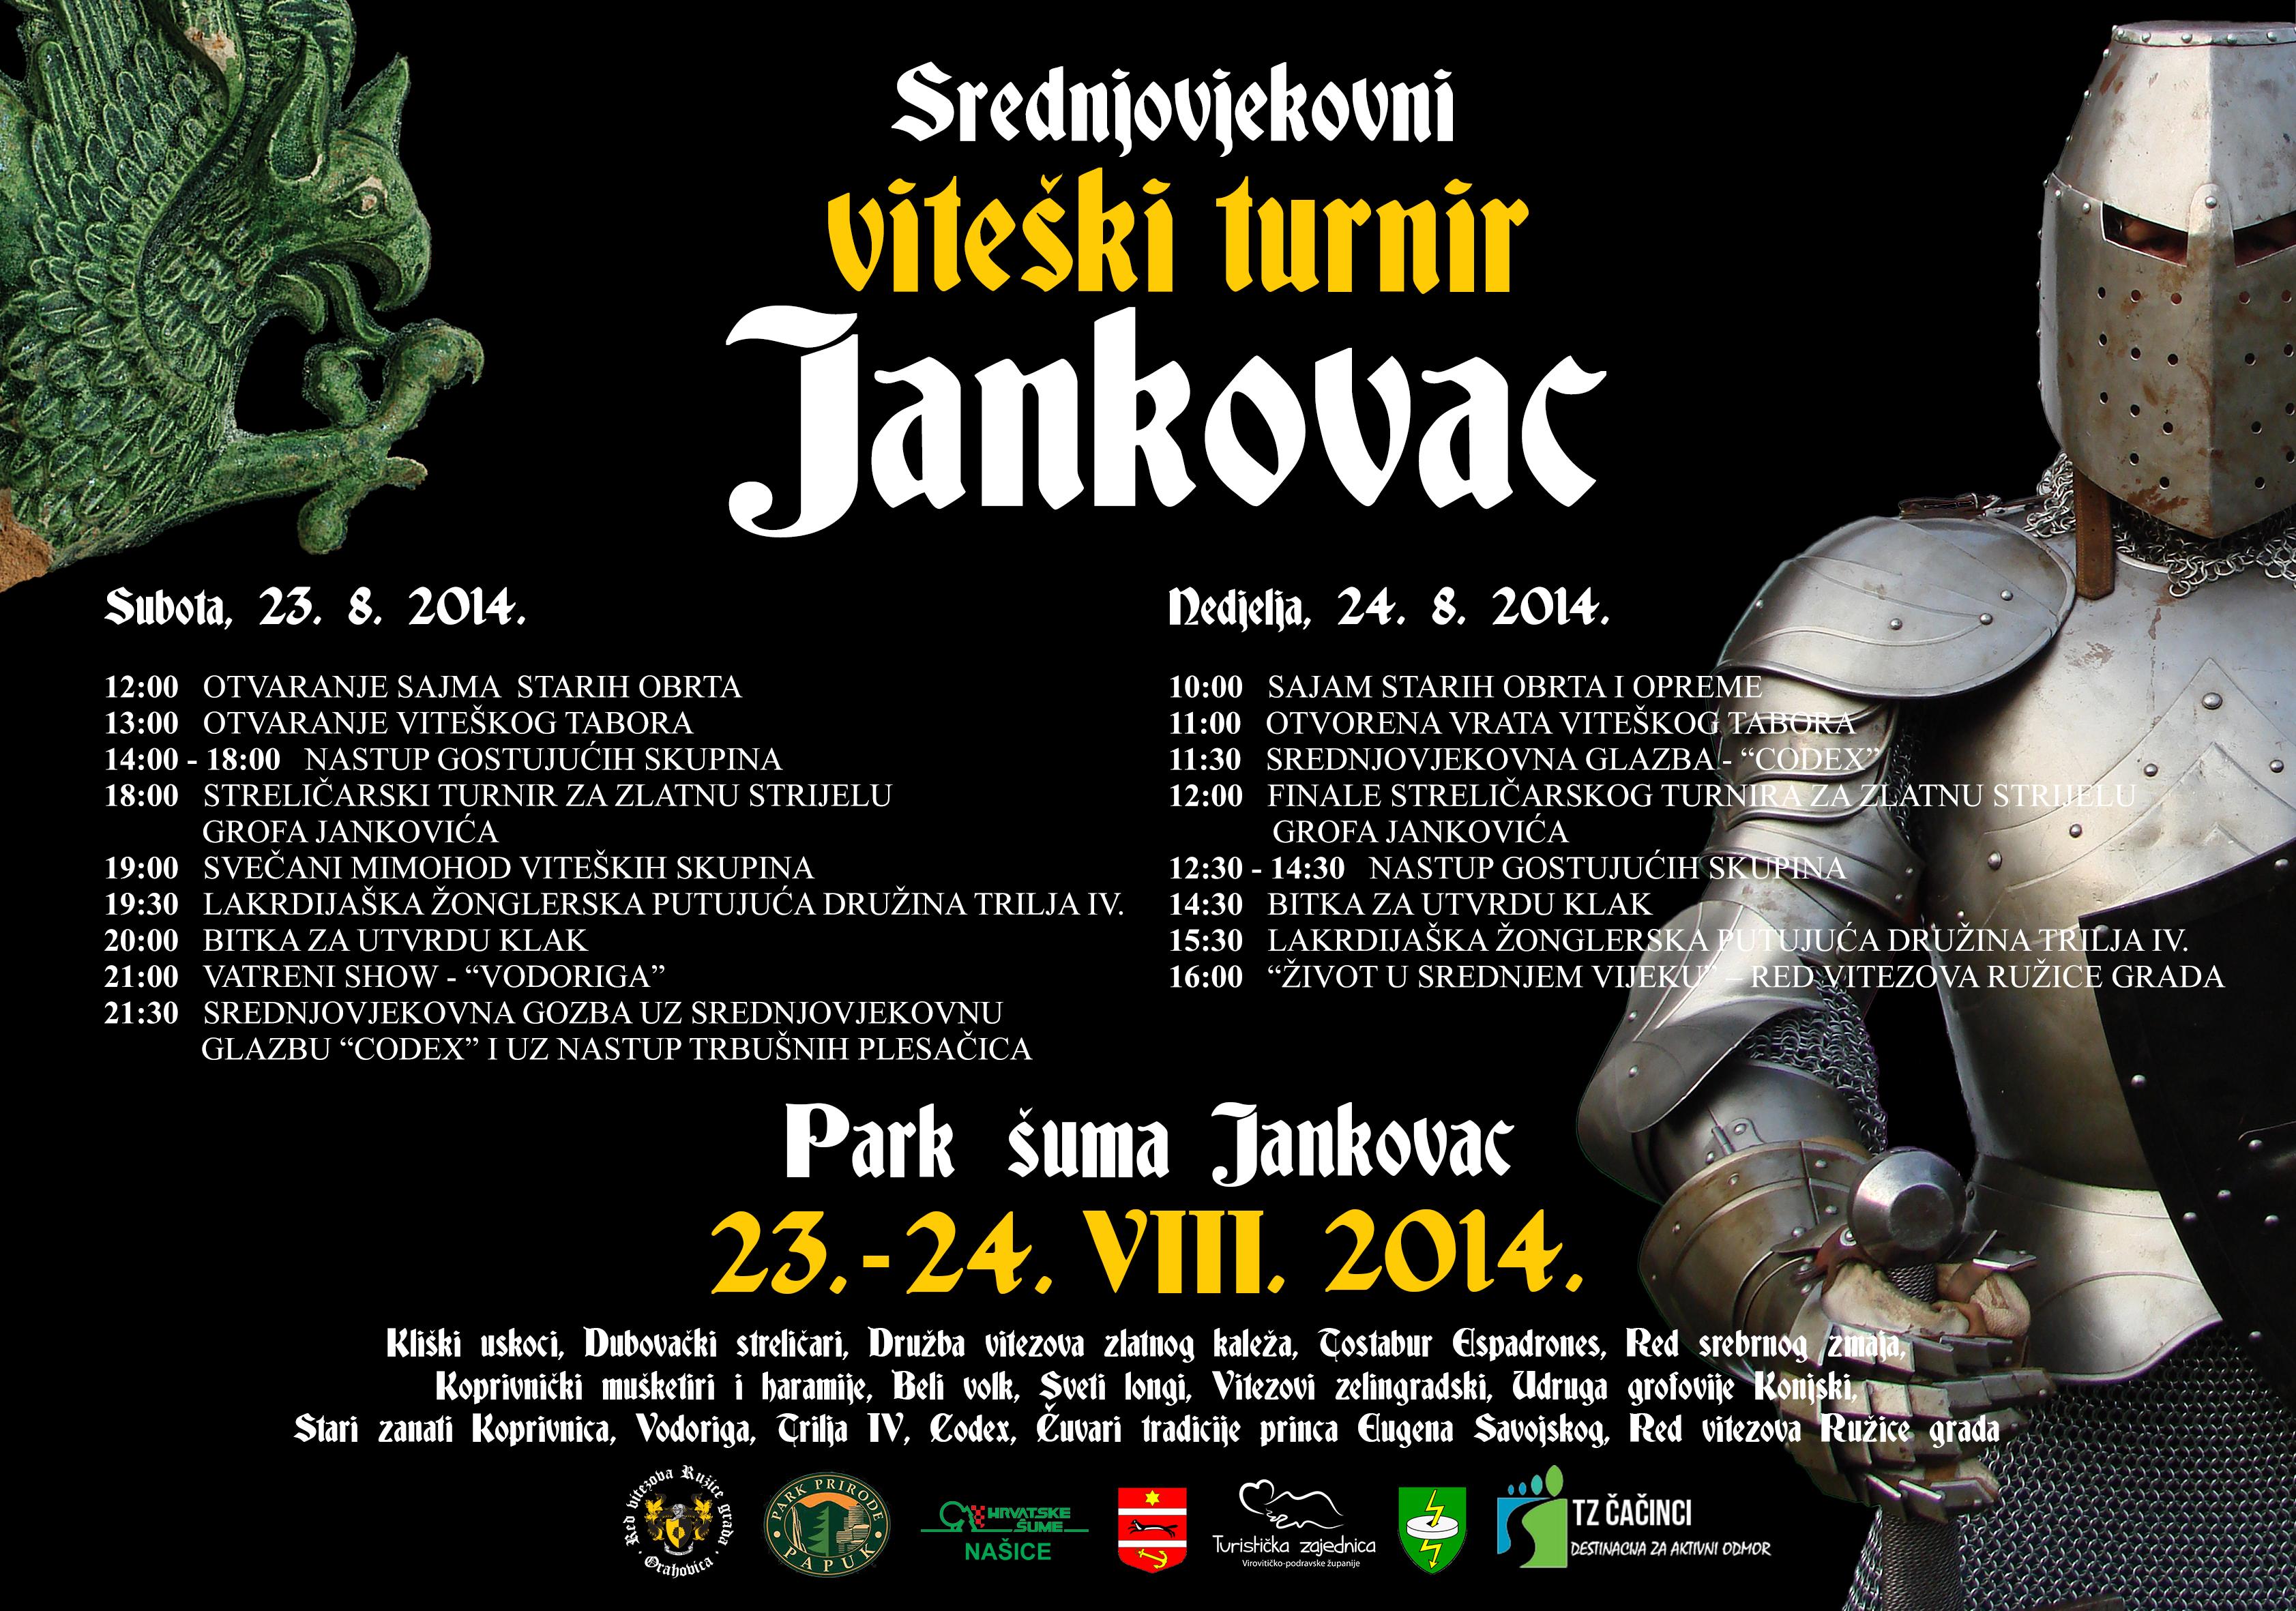 Jankovac_14_plakat_H_web